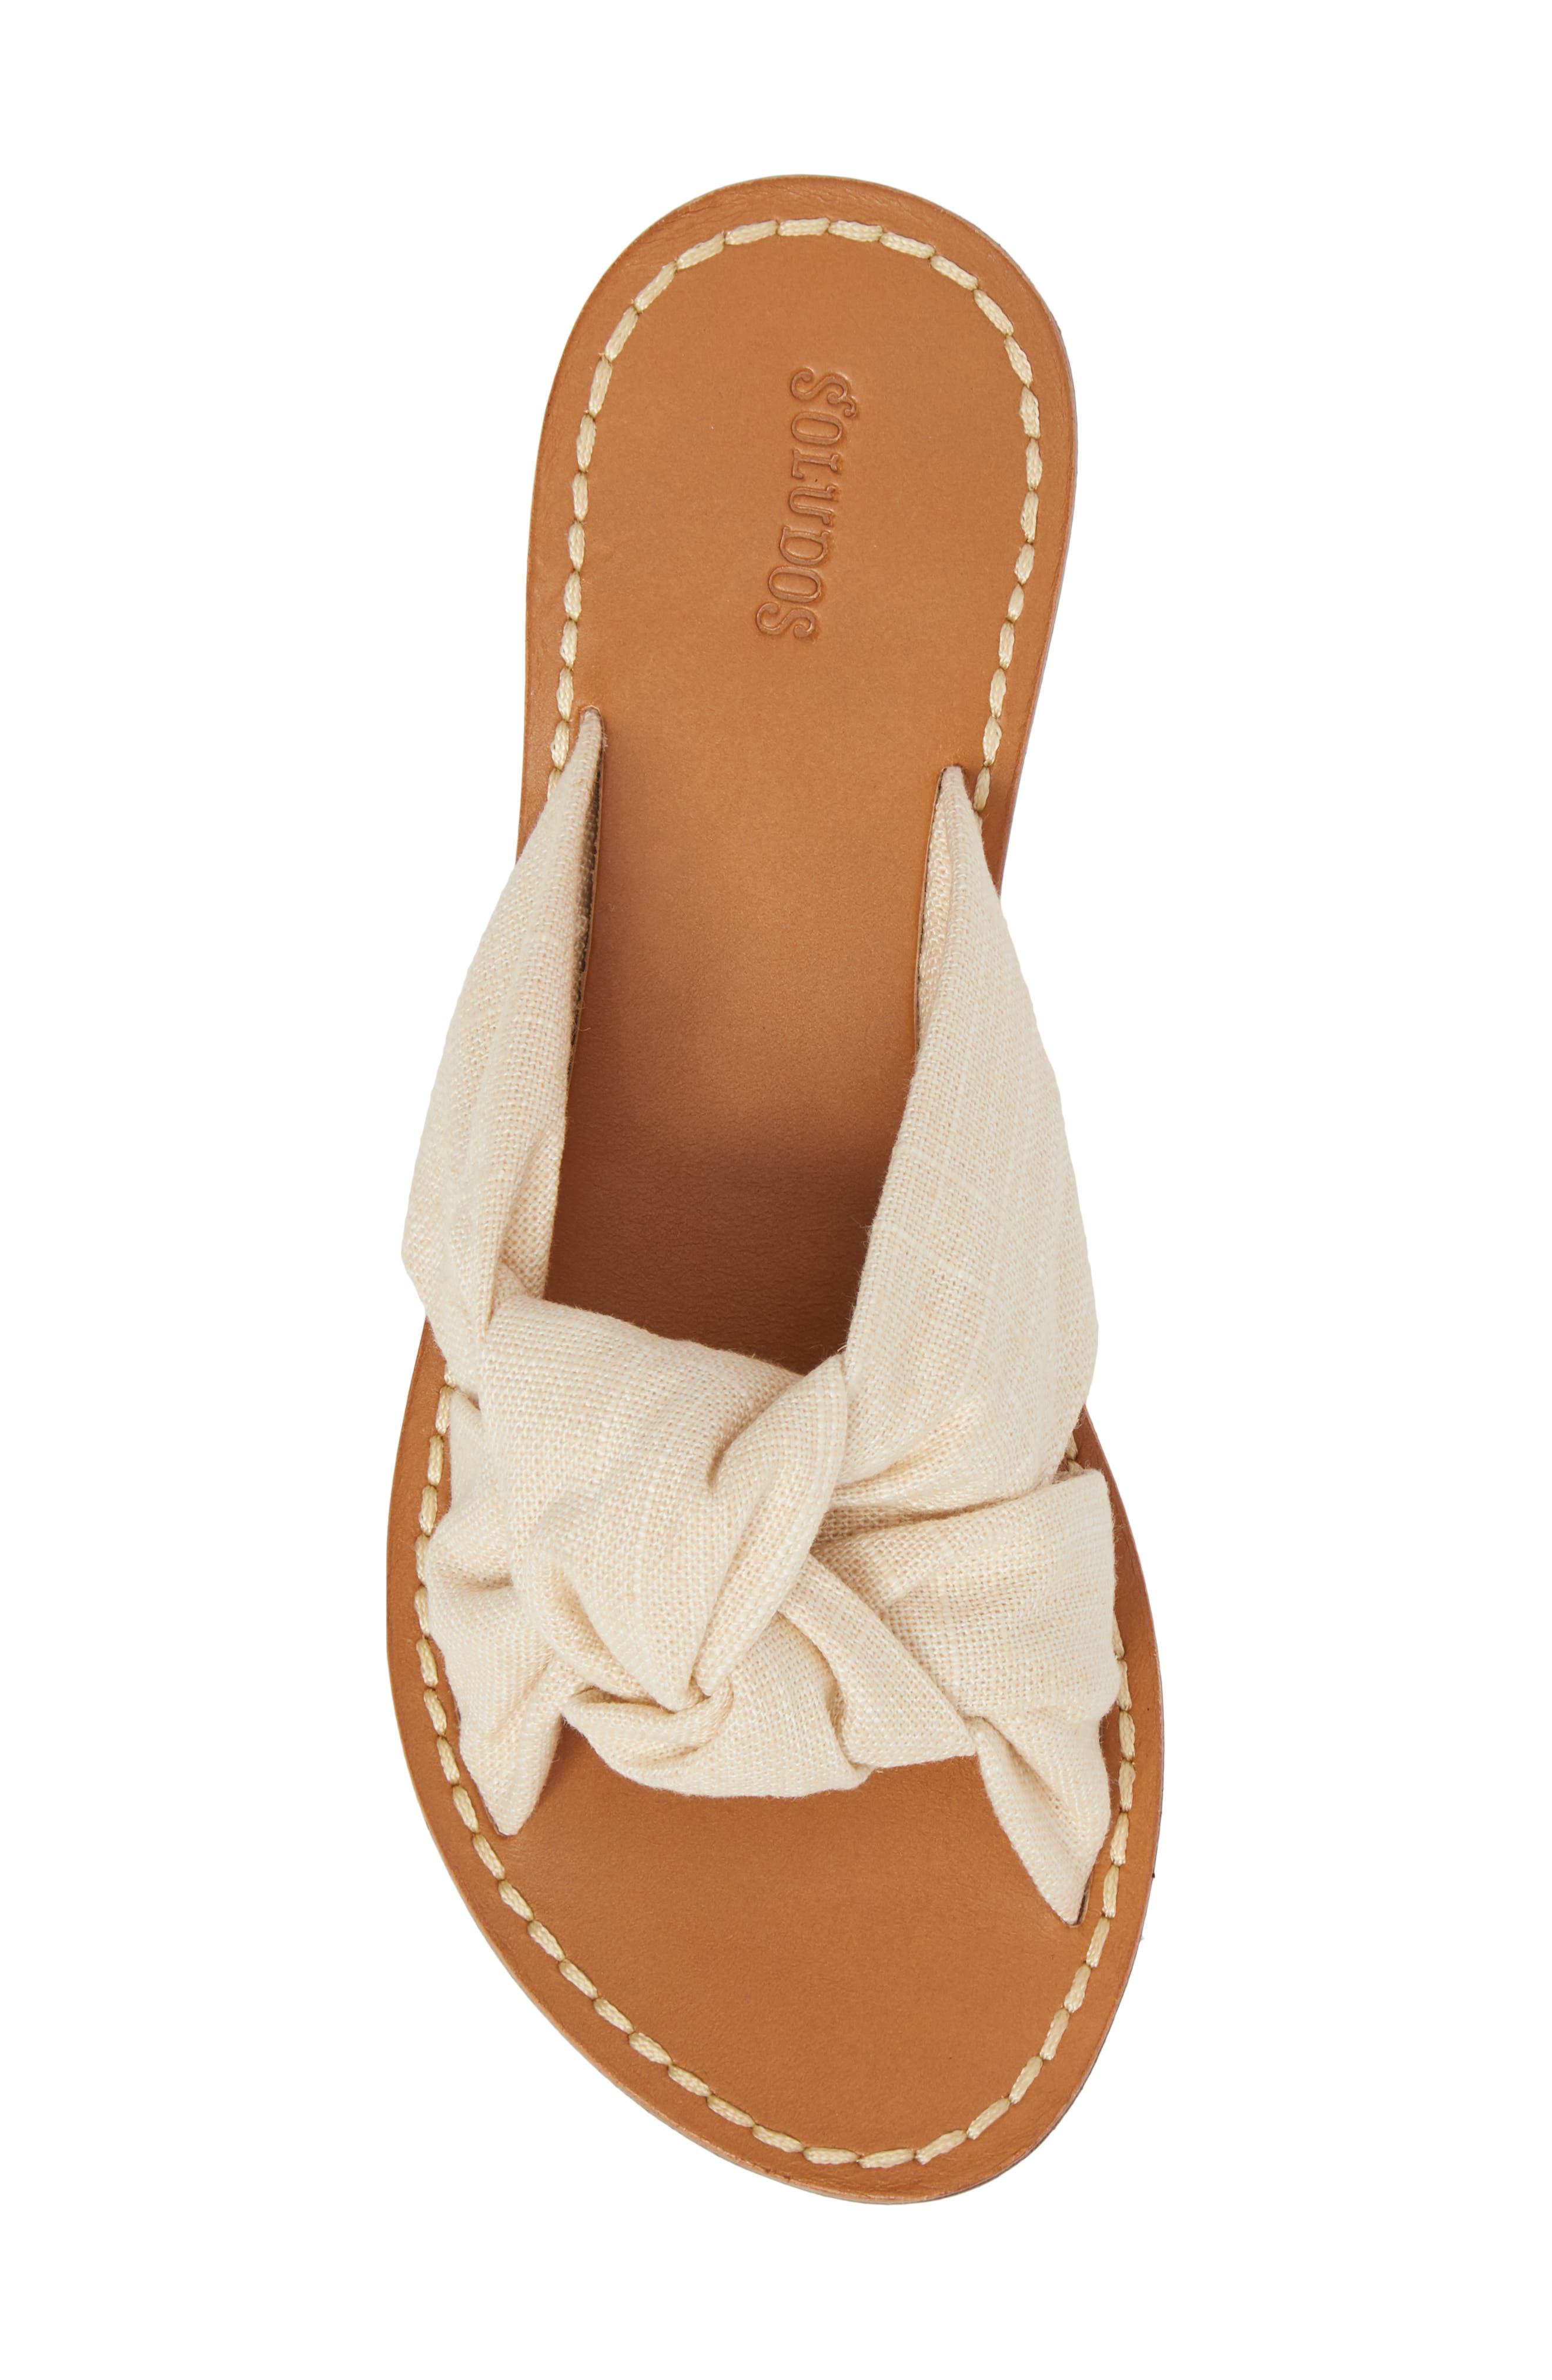 Knotted Slide Sandal,                             Alternate thumbnail 5, color,                             Blush Fabric